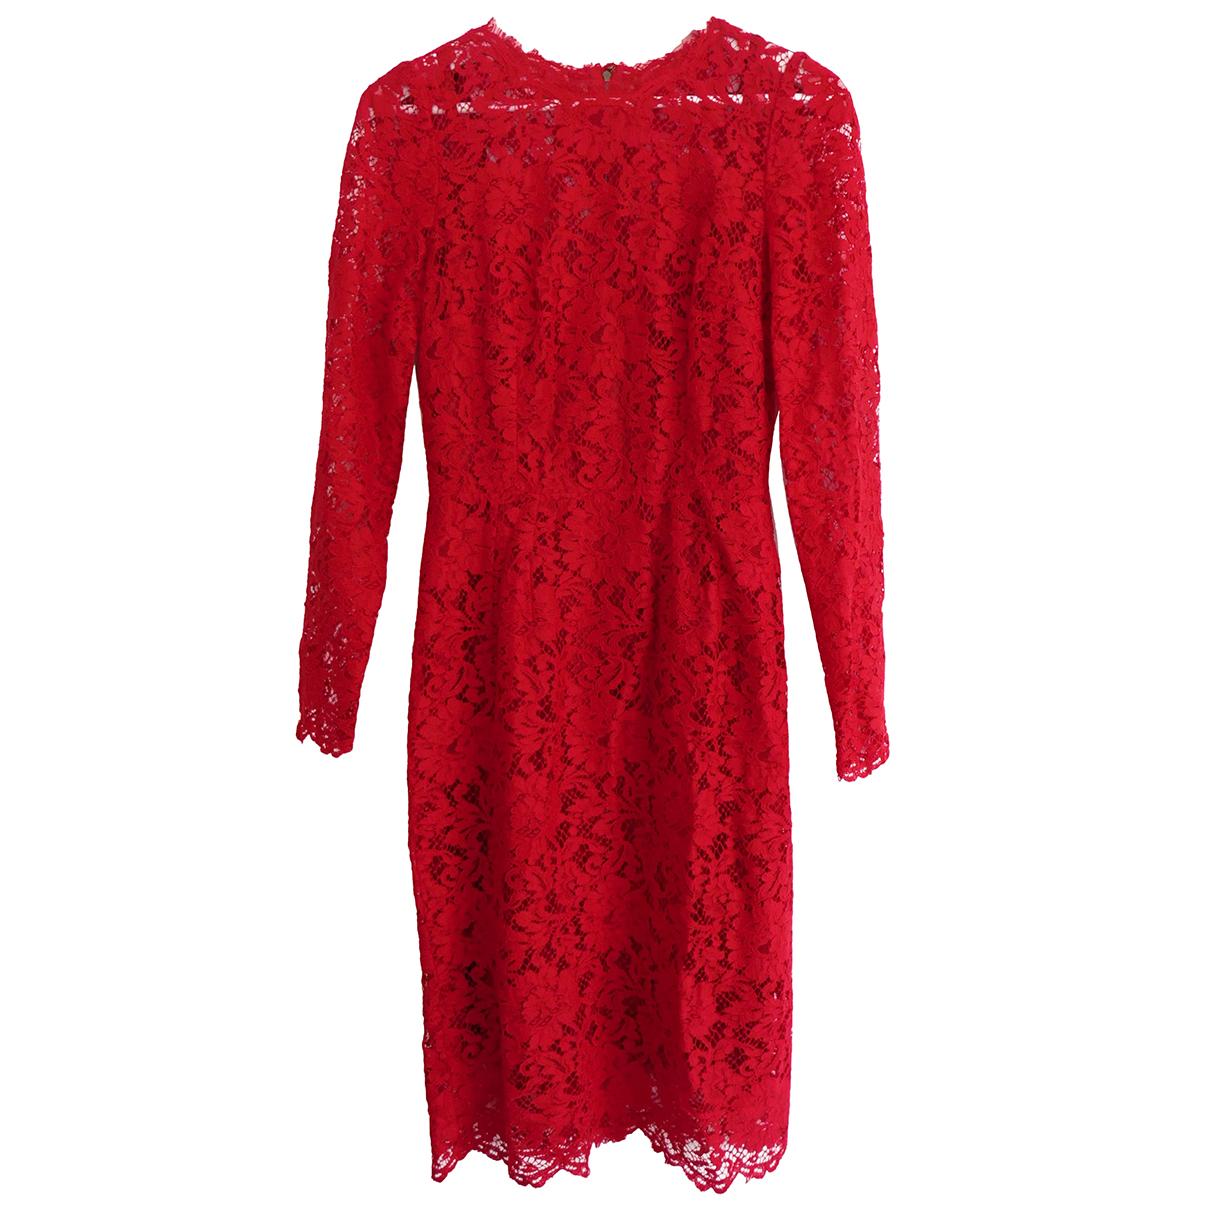 Dolce & Gabbana - Robe   pour femme en dentelle - rouge